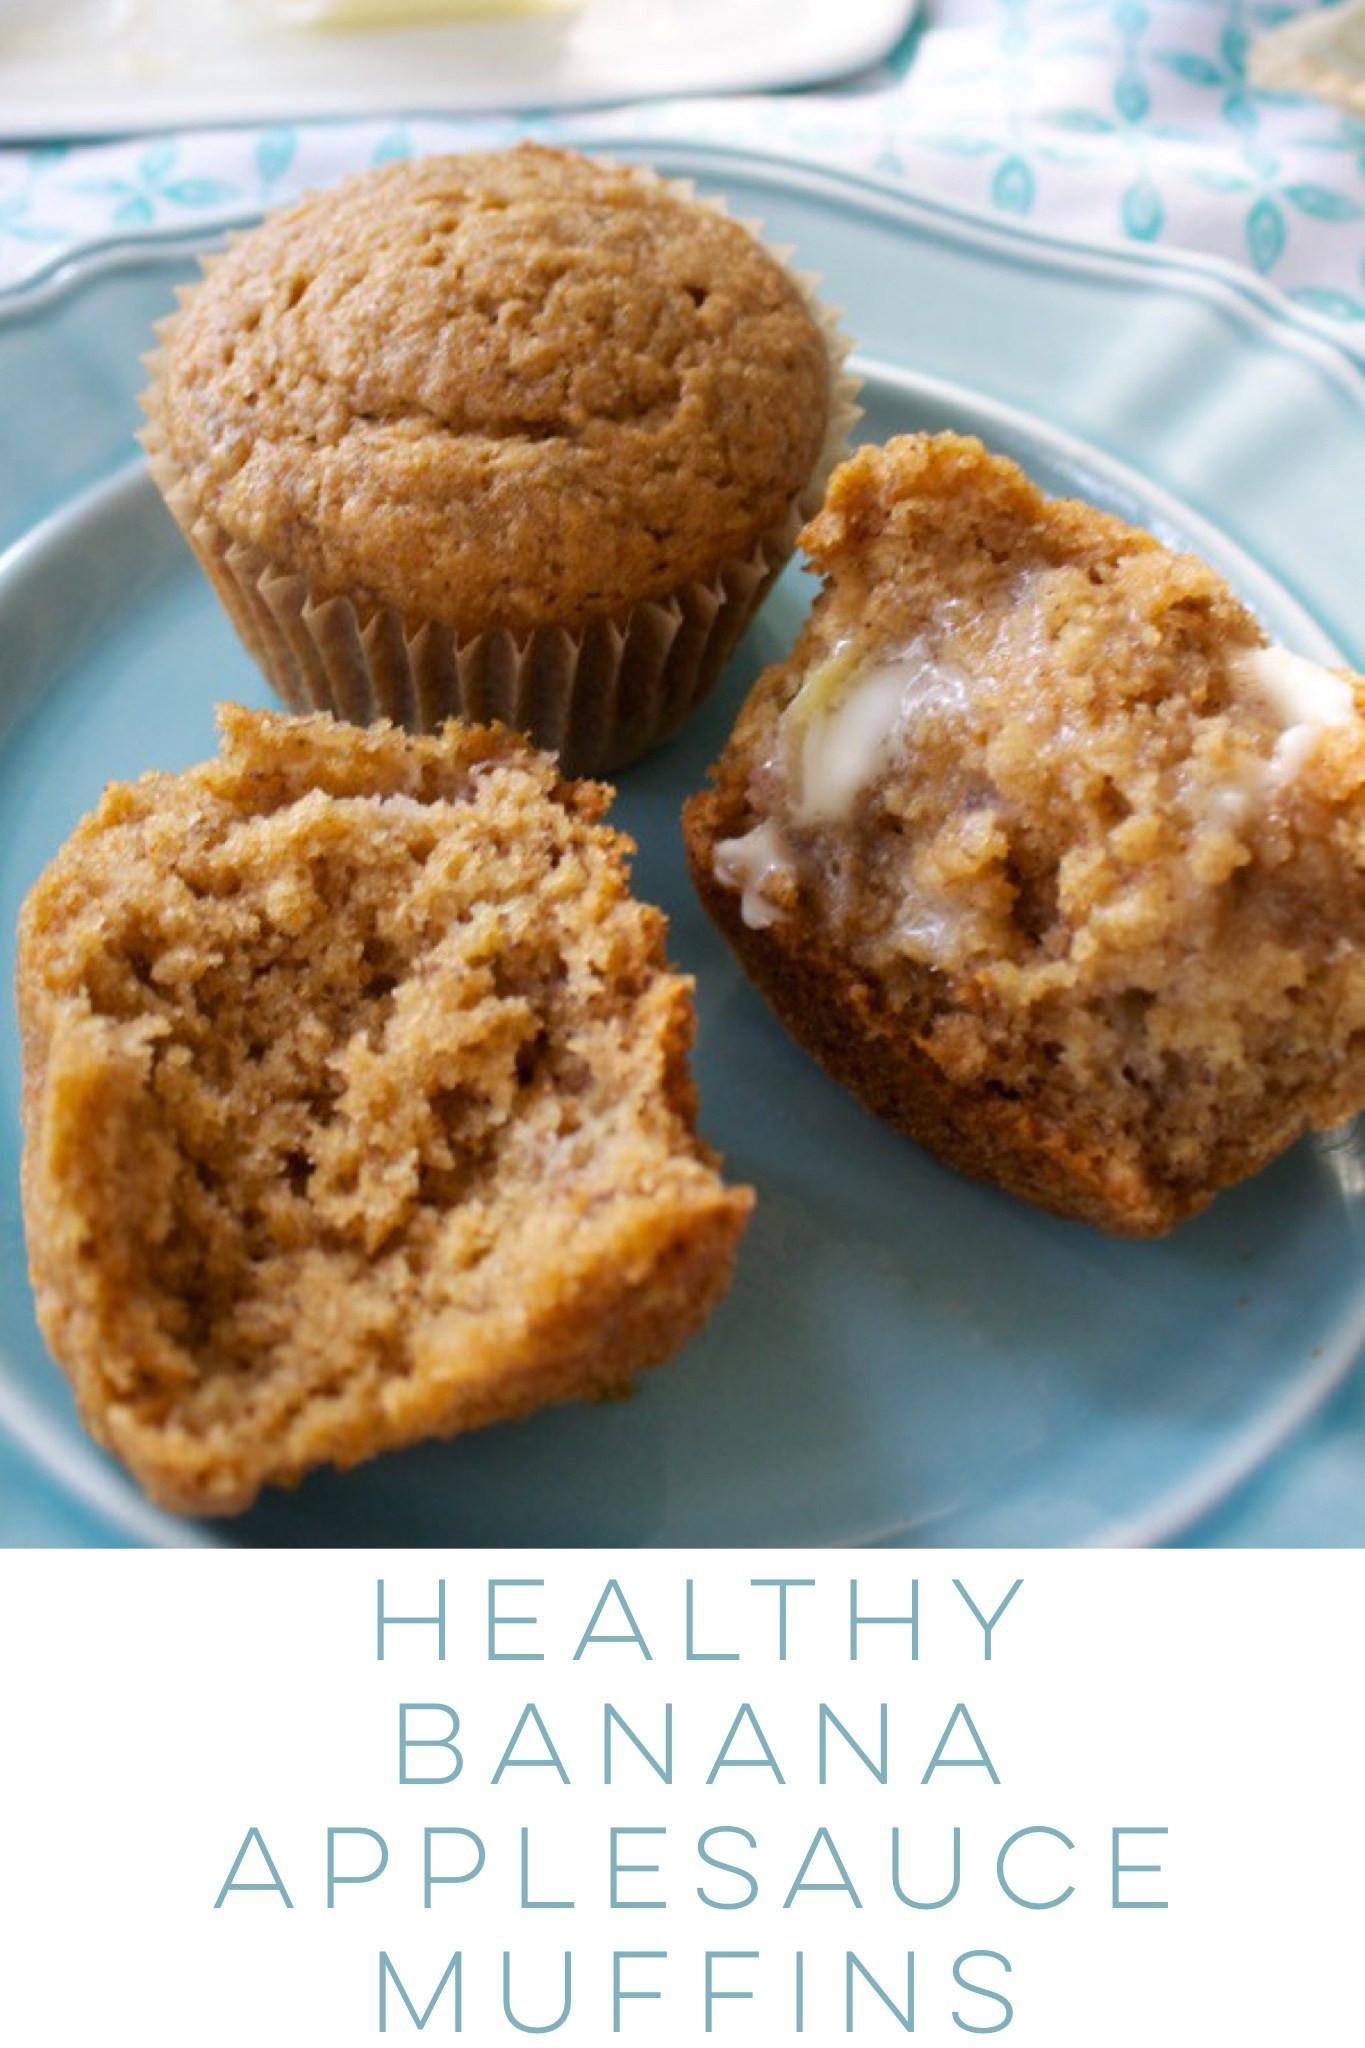 Healthy Applesauce Muffins  Healthy Banana Applesauce Muffins Bet Dinner